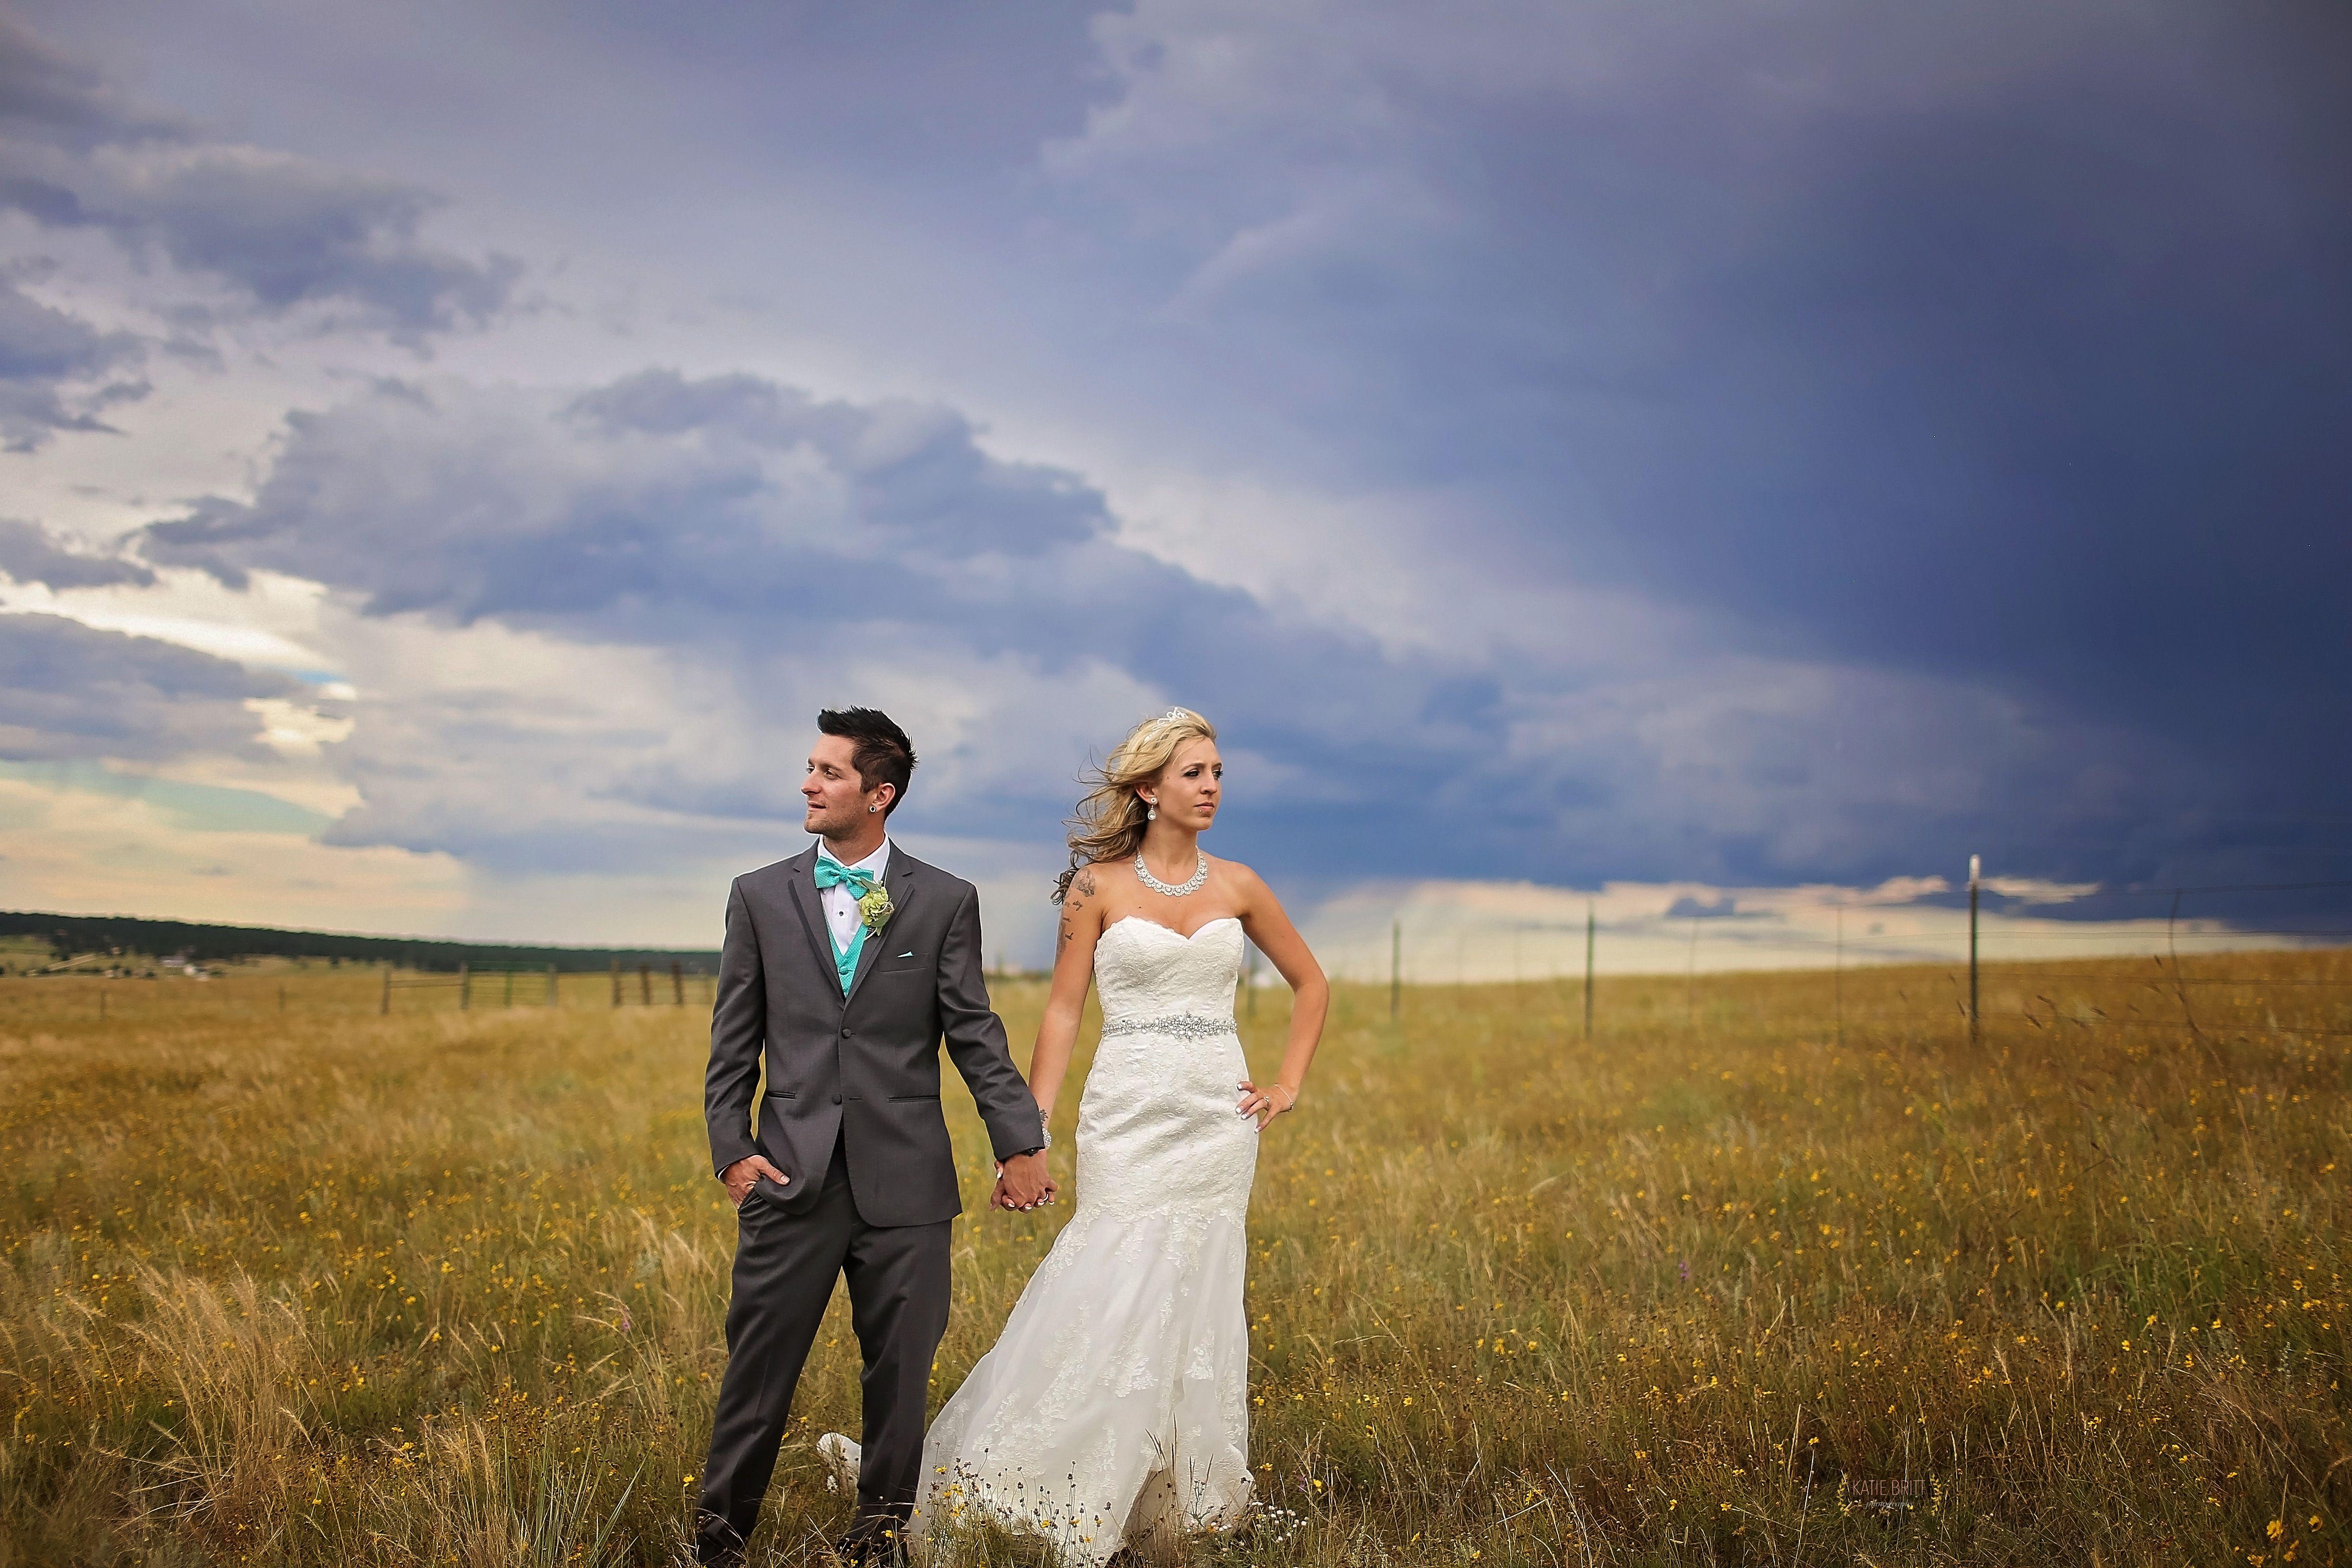 Wedding photography. bride and groom poses. Atlanta wedding photography. Katie Britt Photography. Bride and groom pictures. Athens Wedding Photographer. Athens Ga.